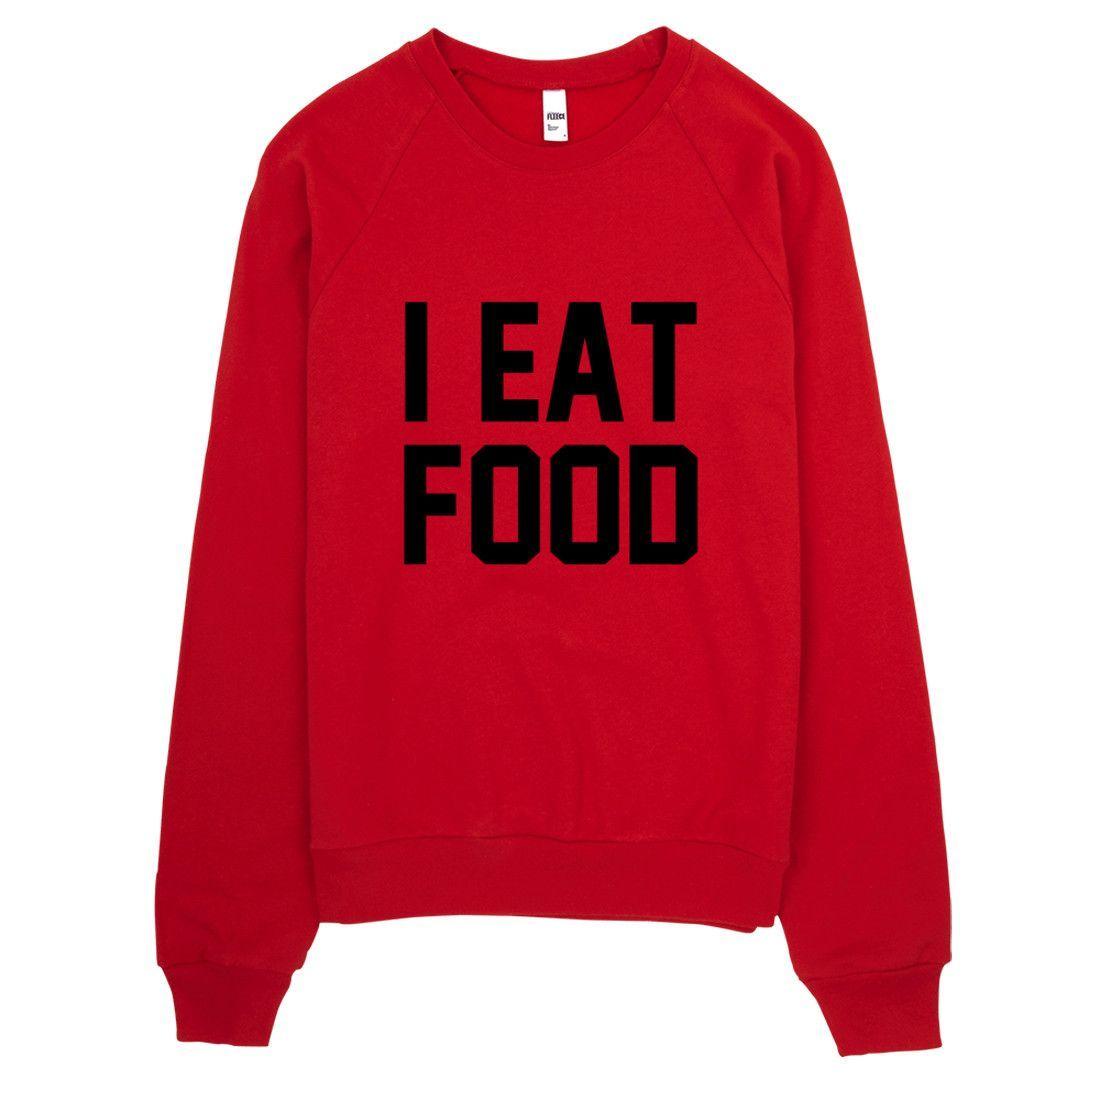 I Eat Food Crewneck Sweater Made in LA